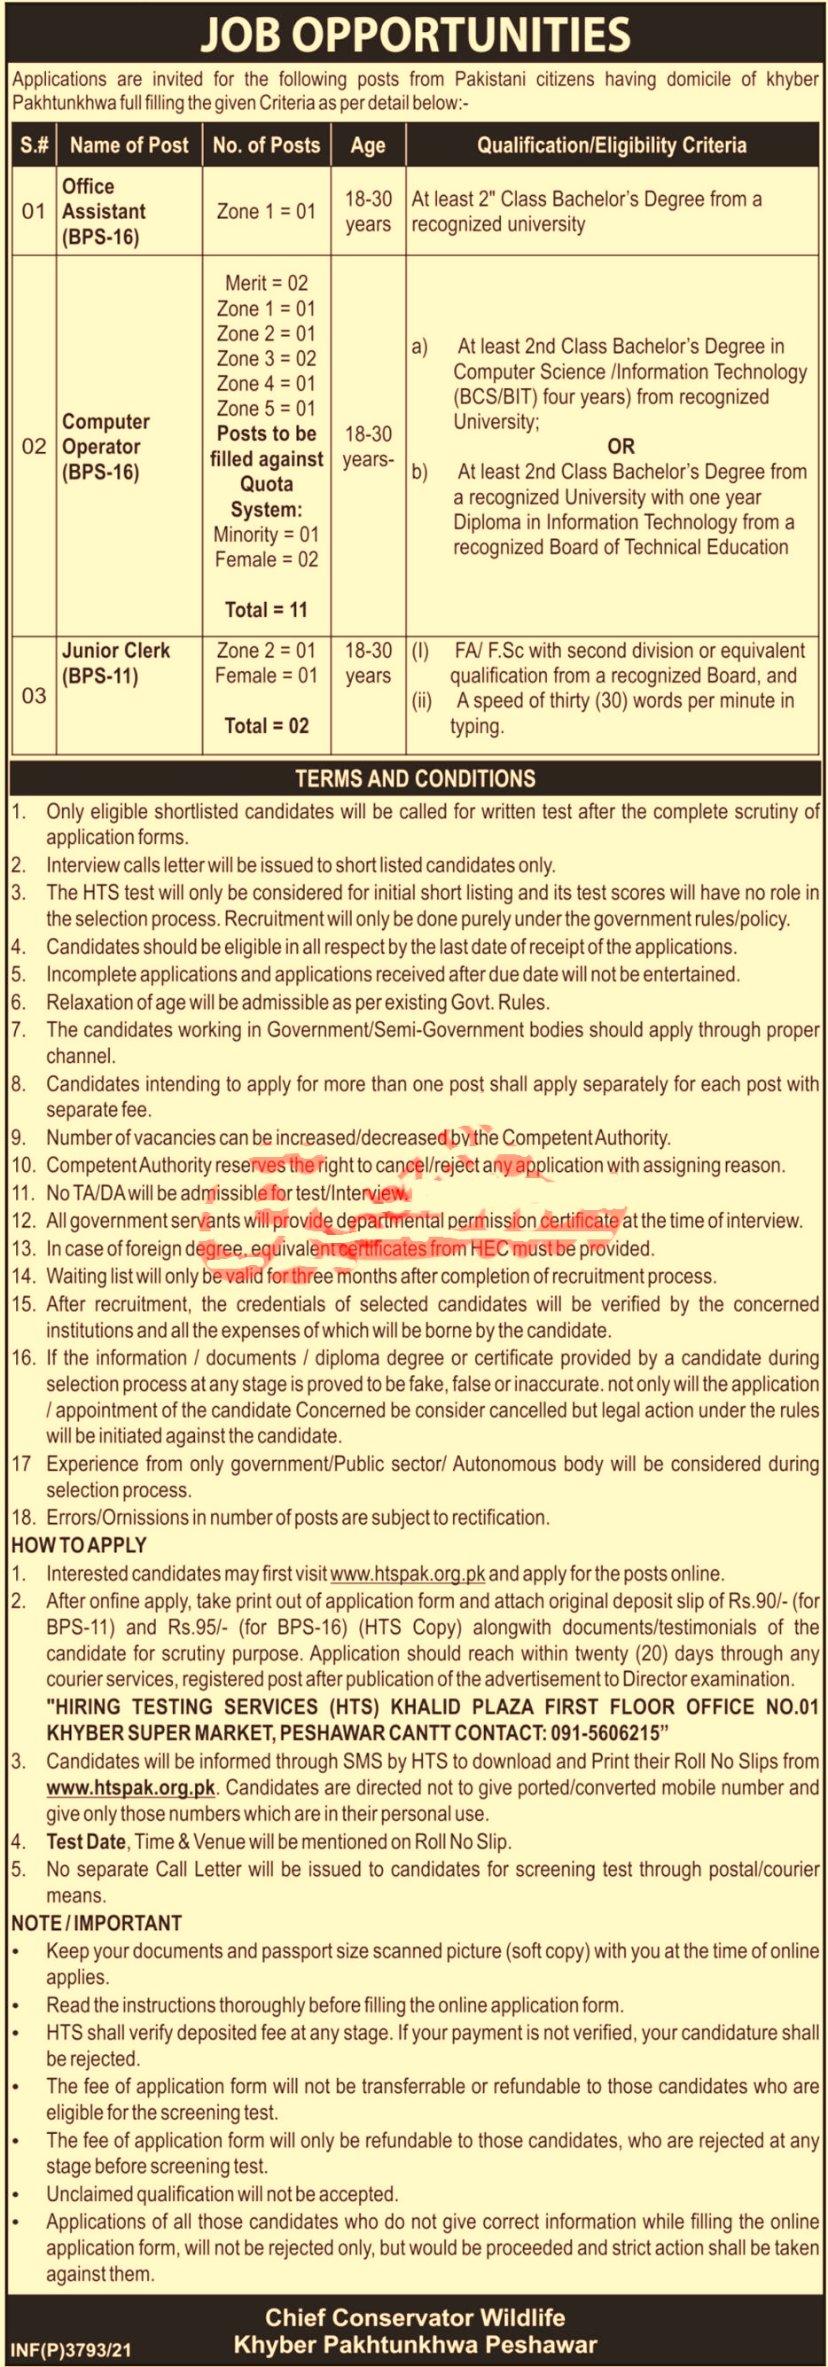 Public Sector Organization Peshawar Jobs 2021 peshawar, Forest & Wildlife Departent KPK Jobs 2021,govt jobs 2020 pes latest jobs kpk, latest jobs in pakistan 2021,latest jobs 2021,jobs in kpk, jobs in kpk 2021, jobs near me,  jobs near me, jobs hiring near me